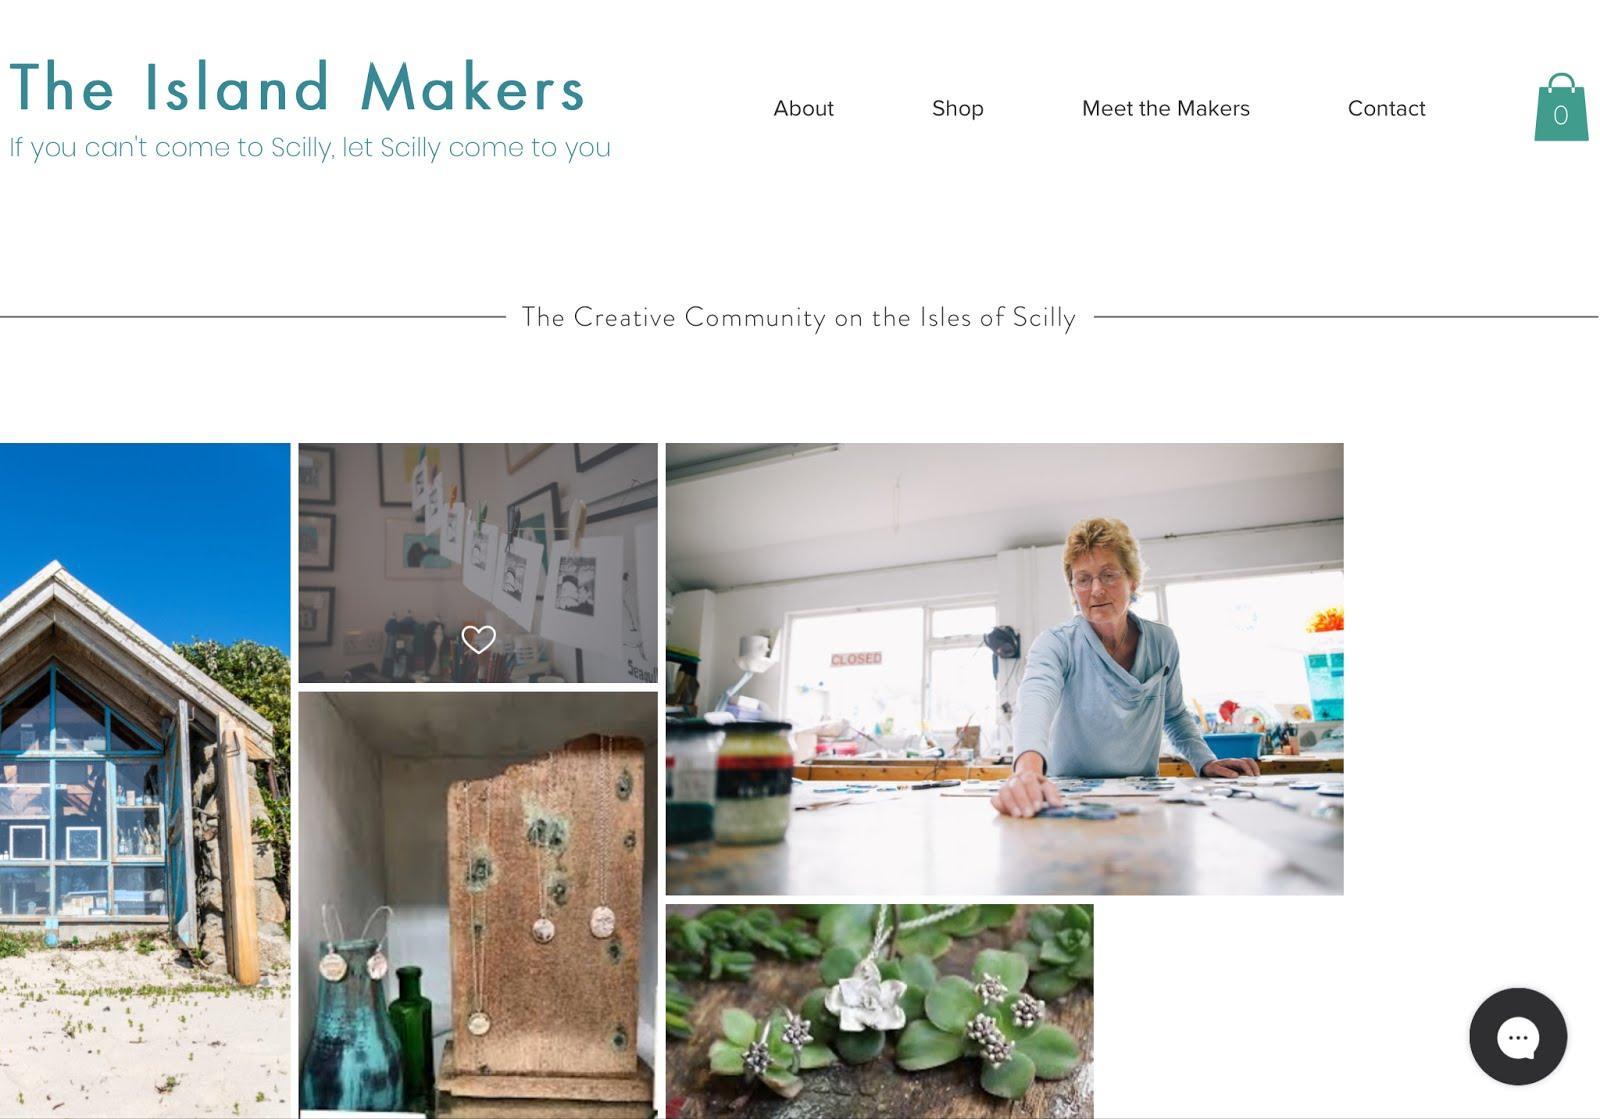 Island makers